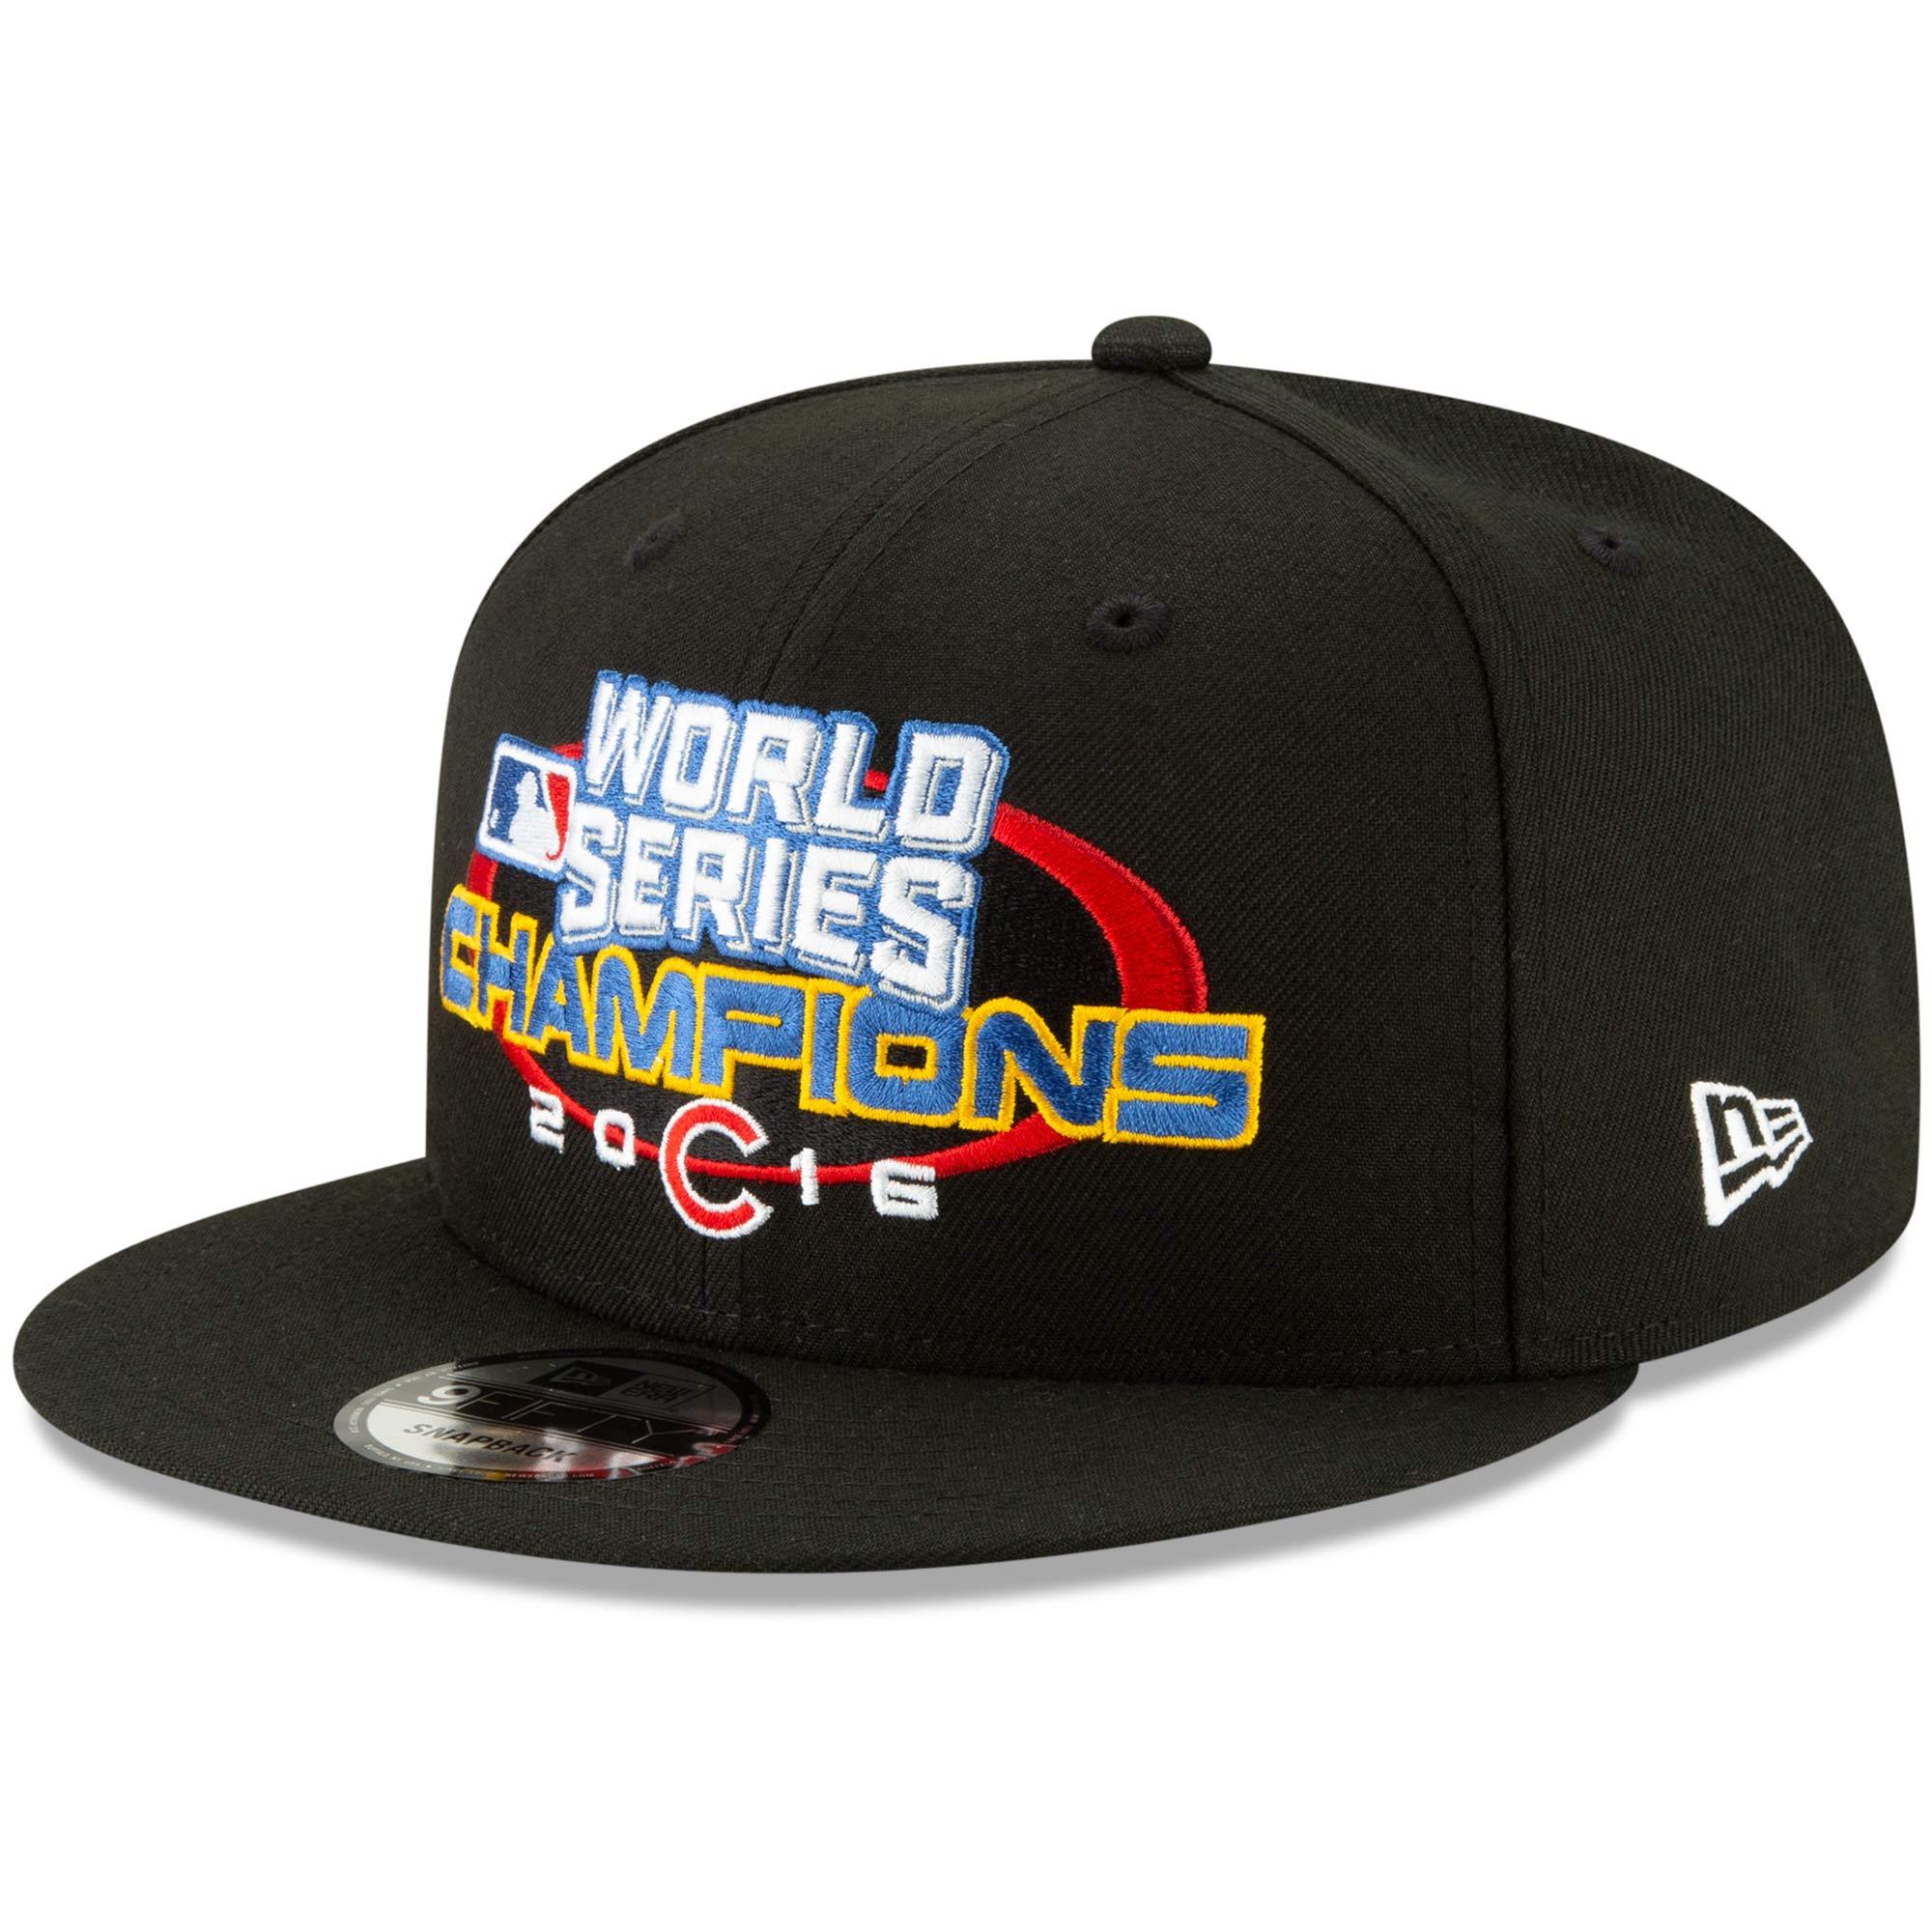 Chicago Cubs New Era World Series Champions Flashback 9FIFTY Adjustable Snapback Hat - Black - OSFA